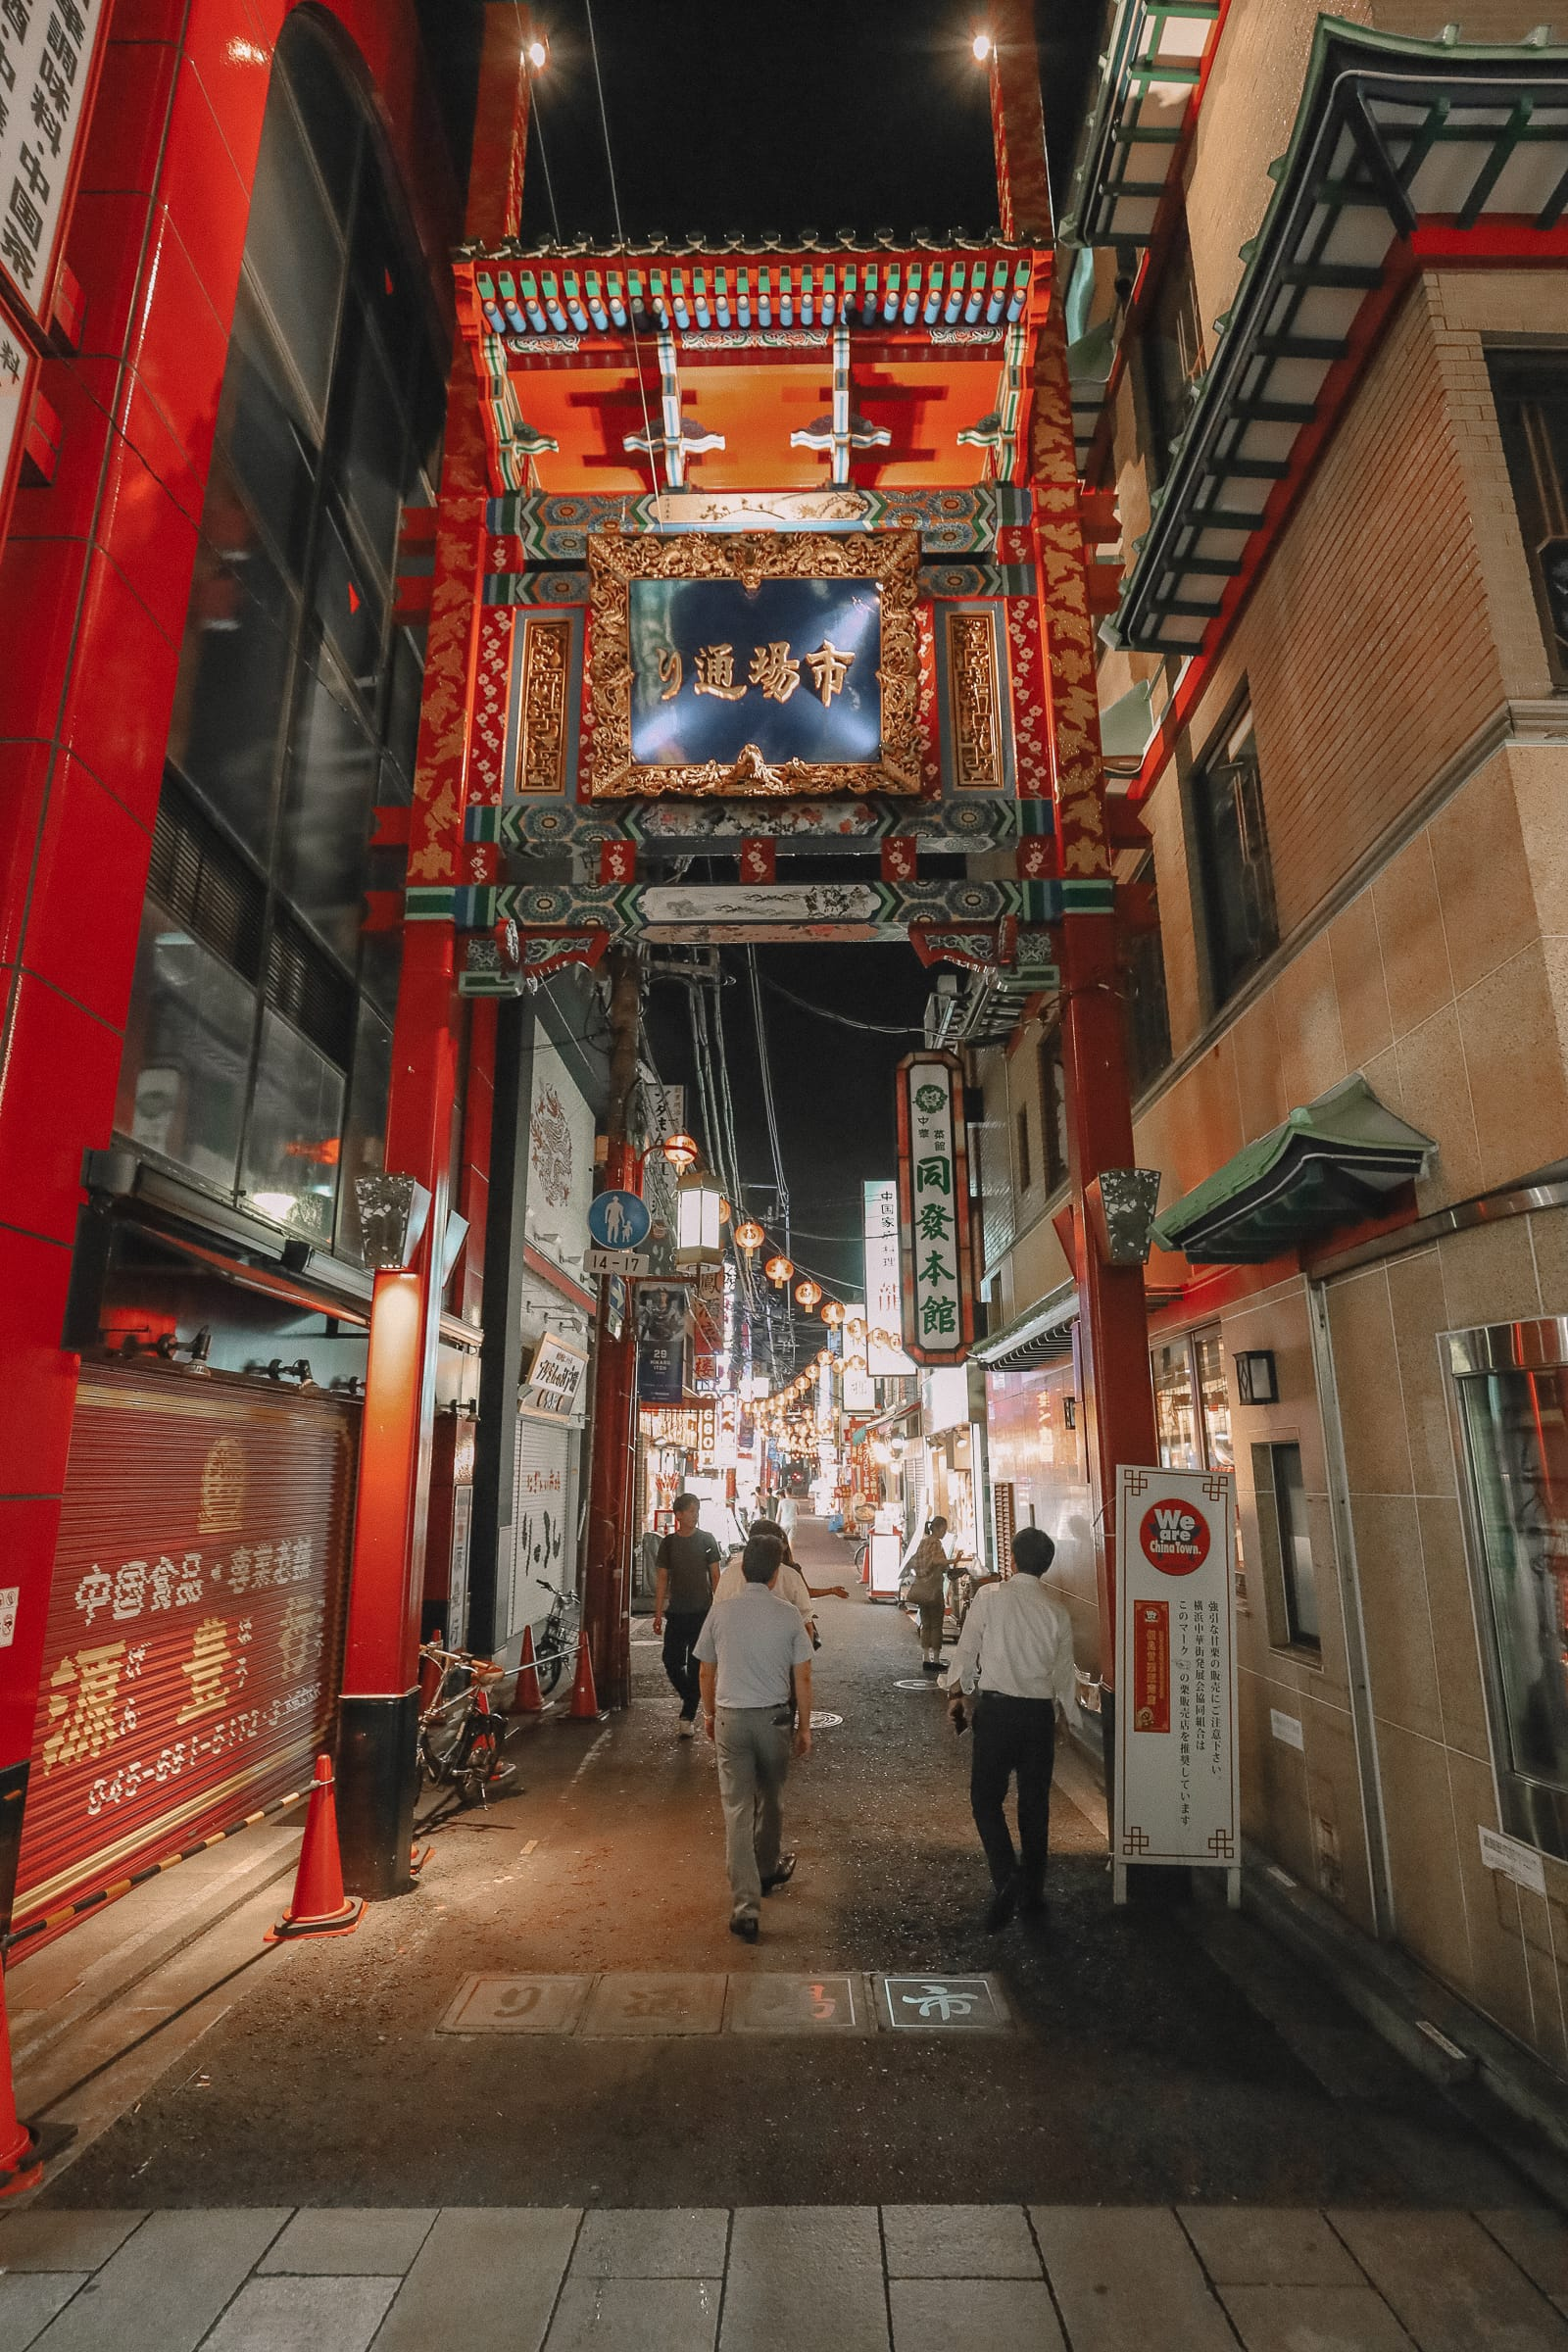 24 Hours Exploring Downtown Yokohama - Japan (12)